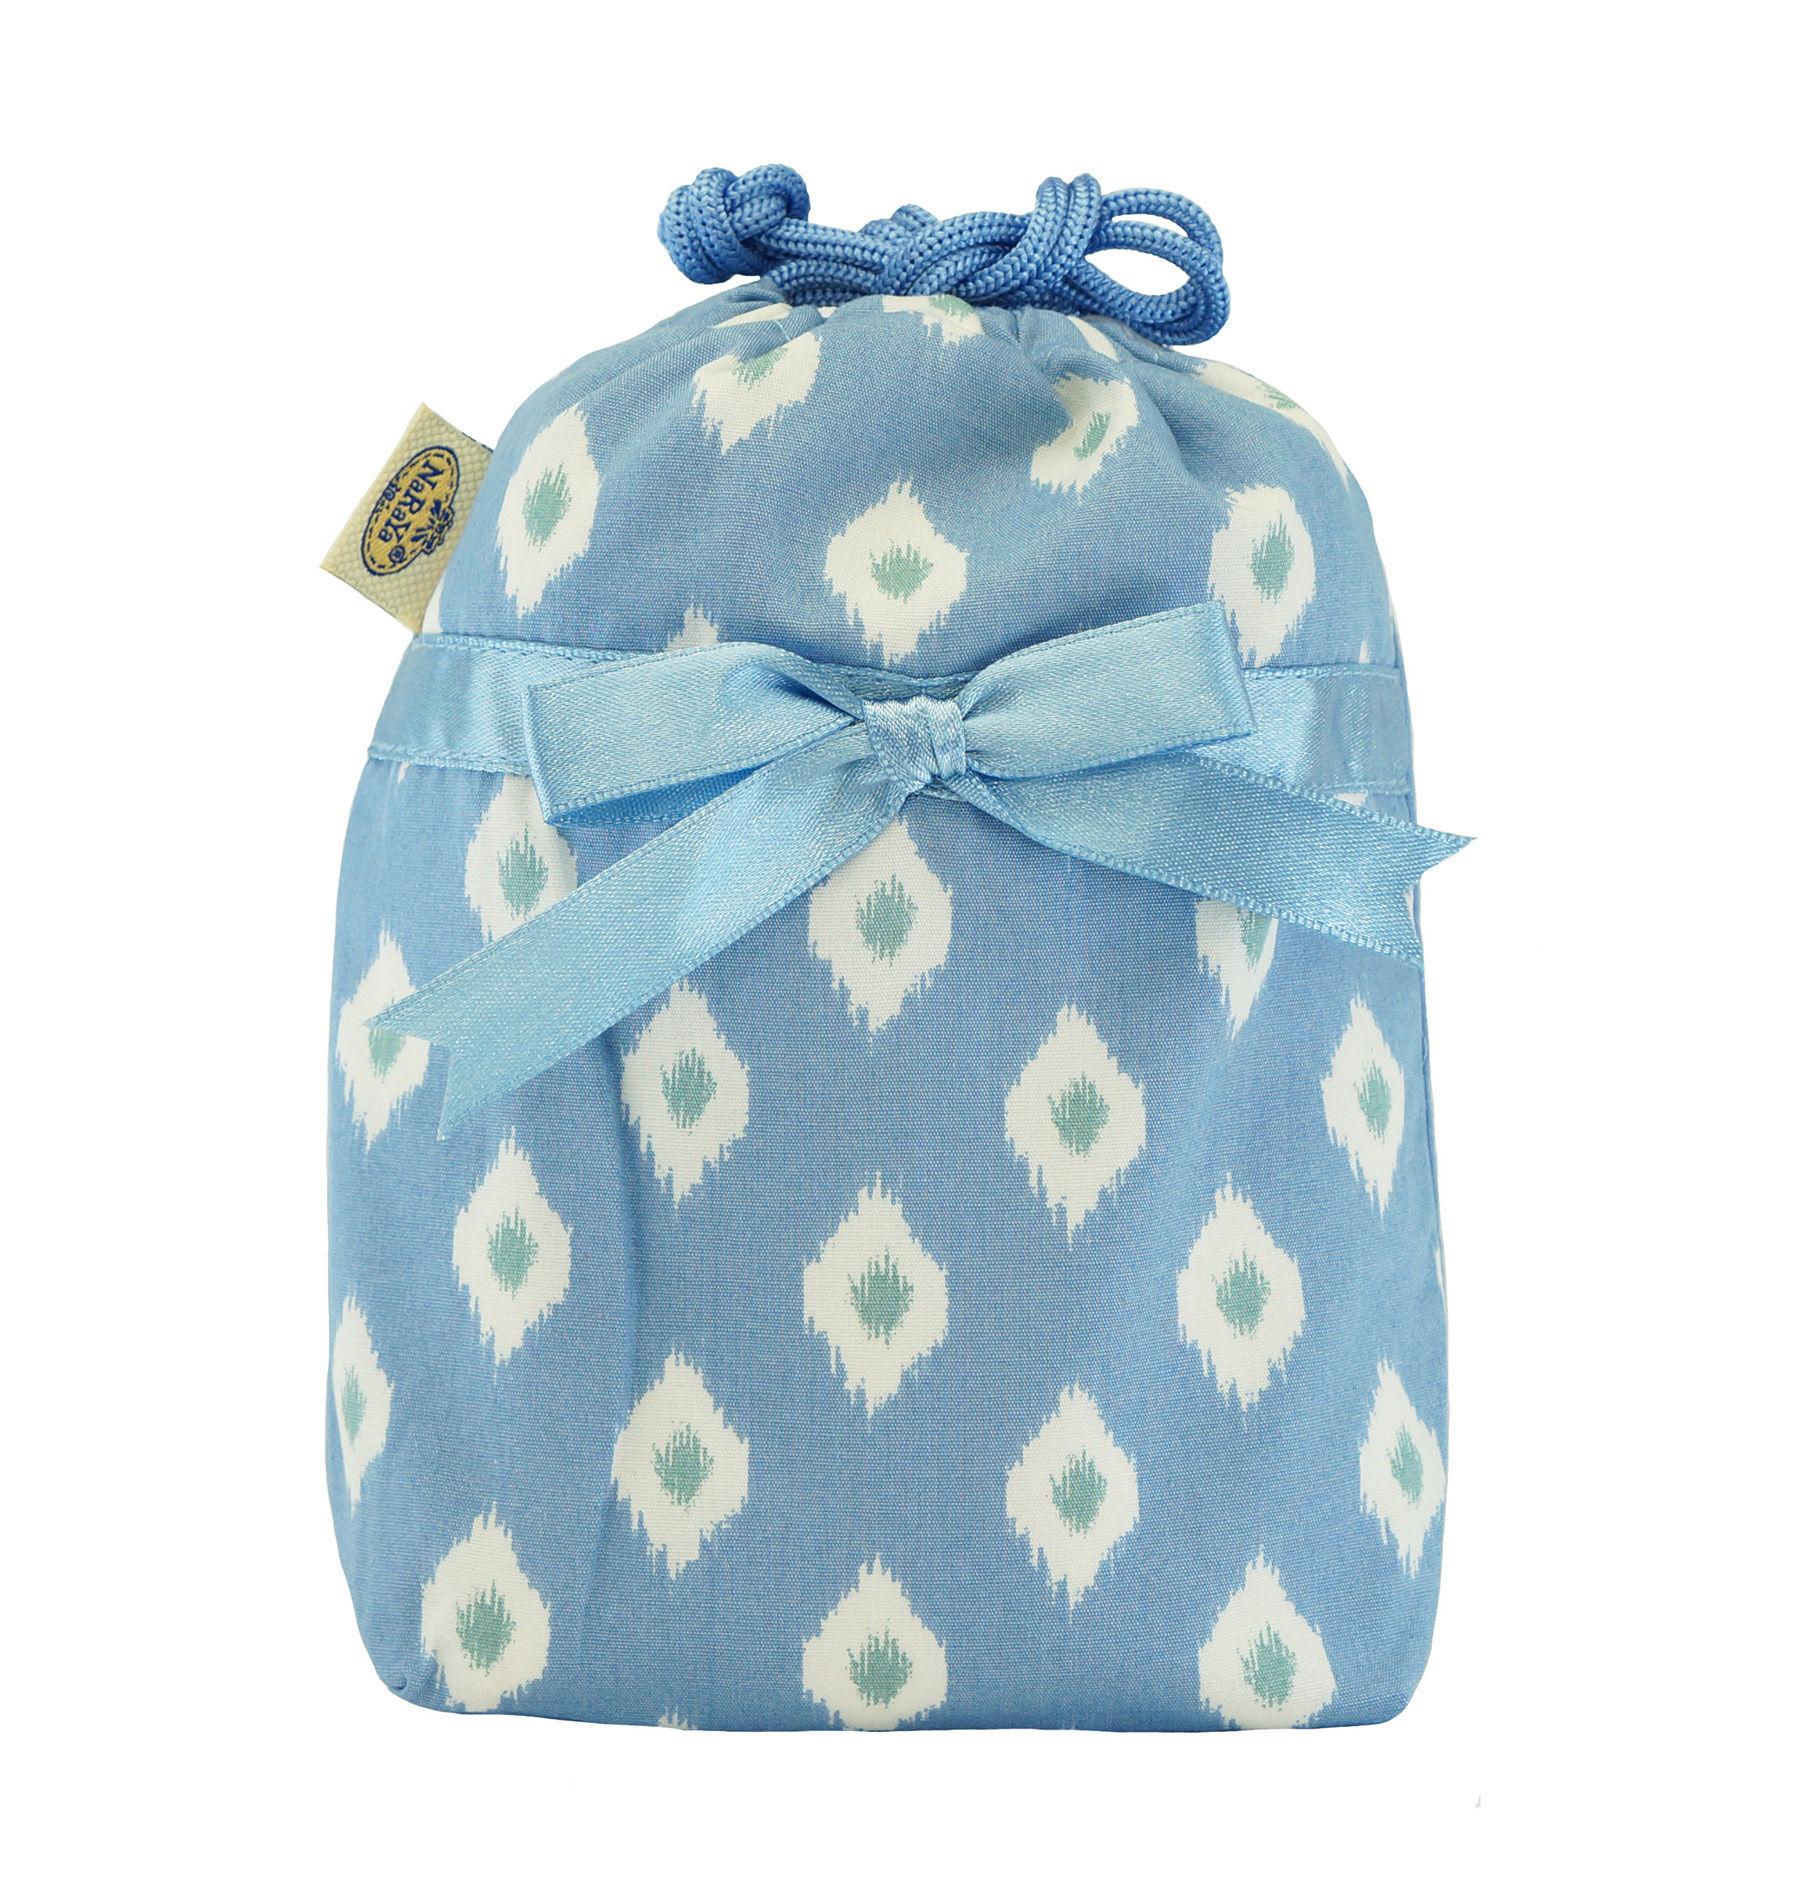 NaRaYa(ナラヤ) 巾着袋ポーチ(ランジェリーポーチ トラベルポーチ)・プロバンス(NB-258/S)